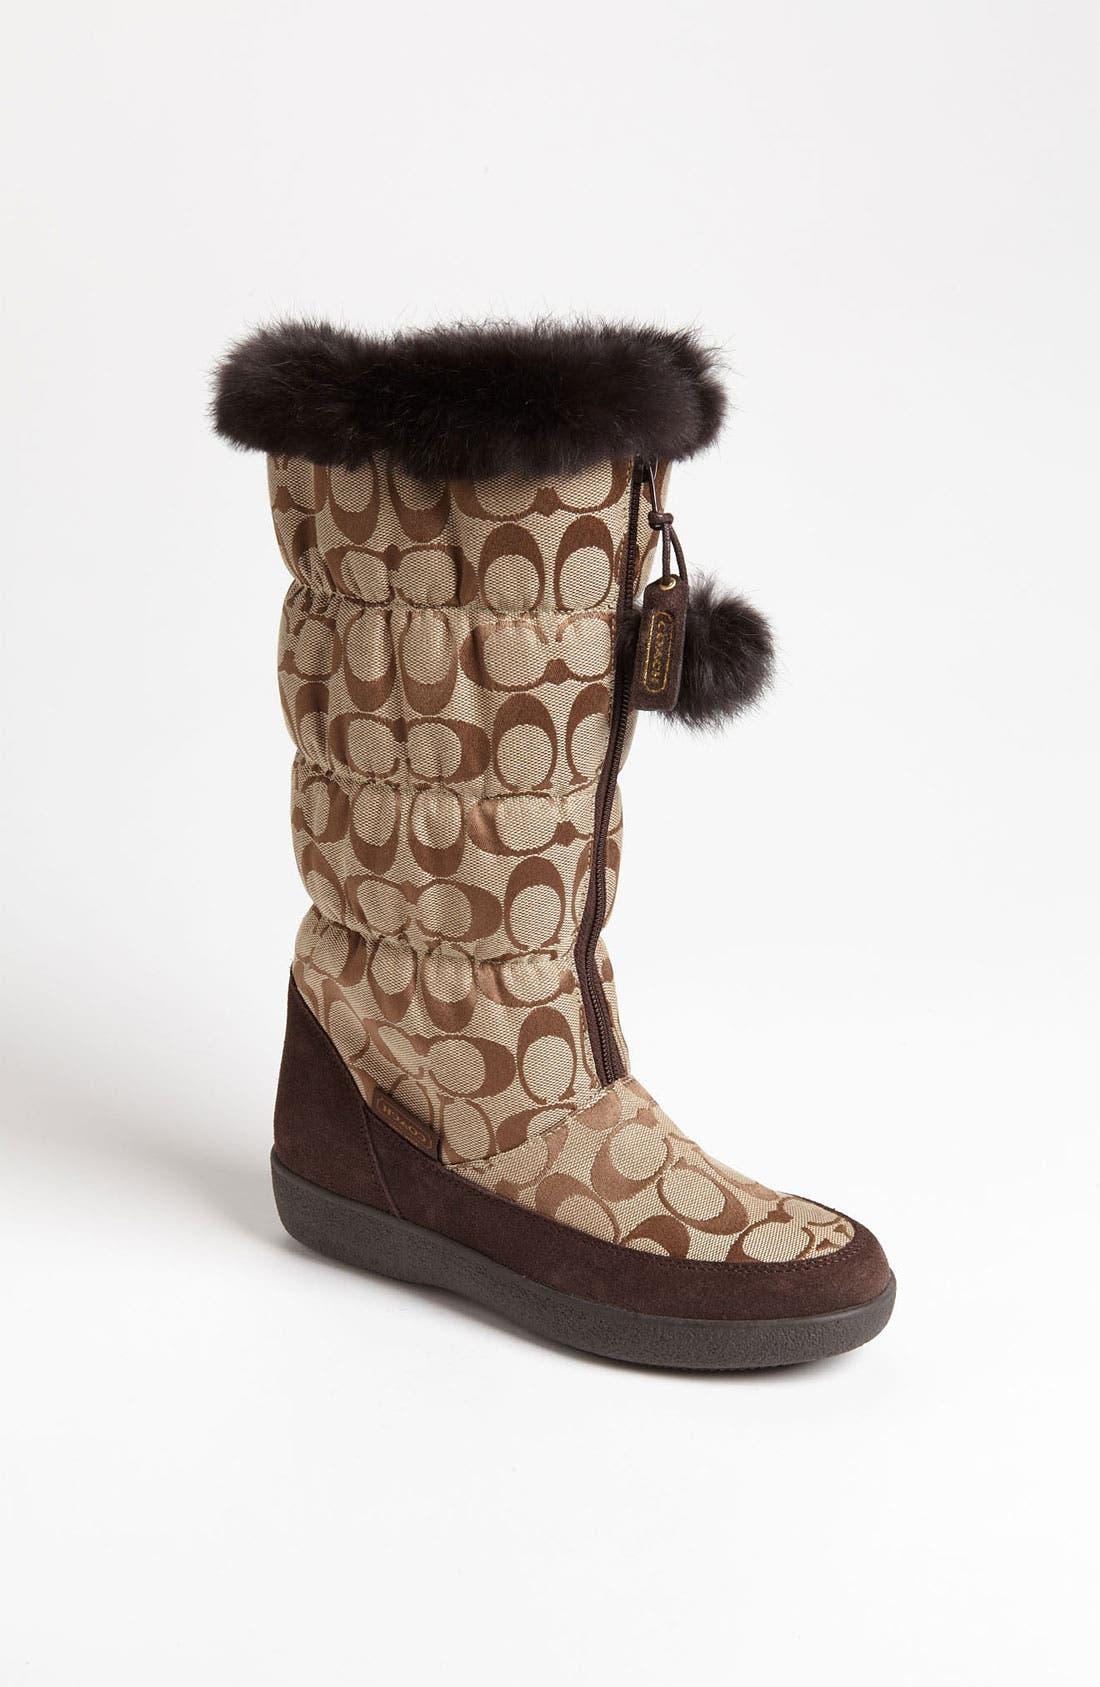 Main Image - COACH 'Theona' Snow Boot